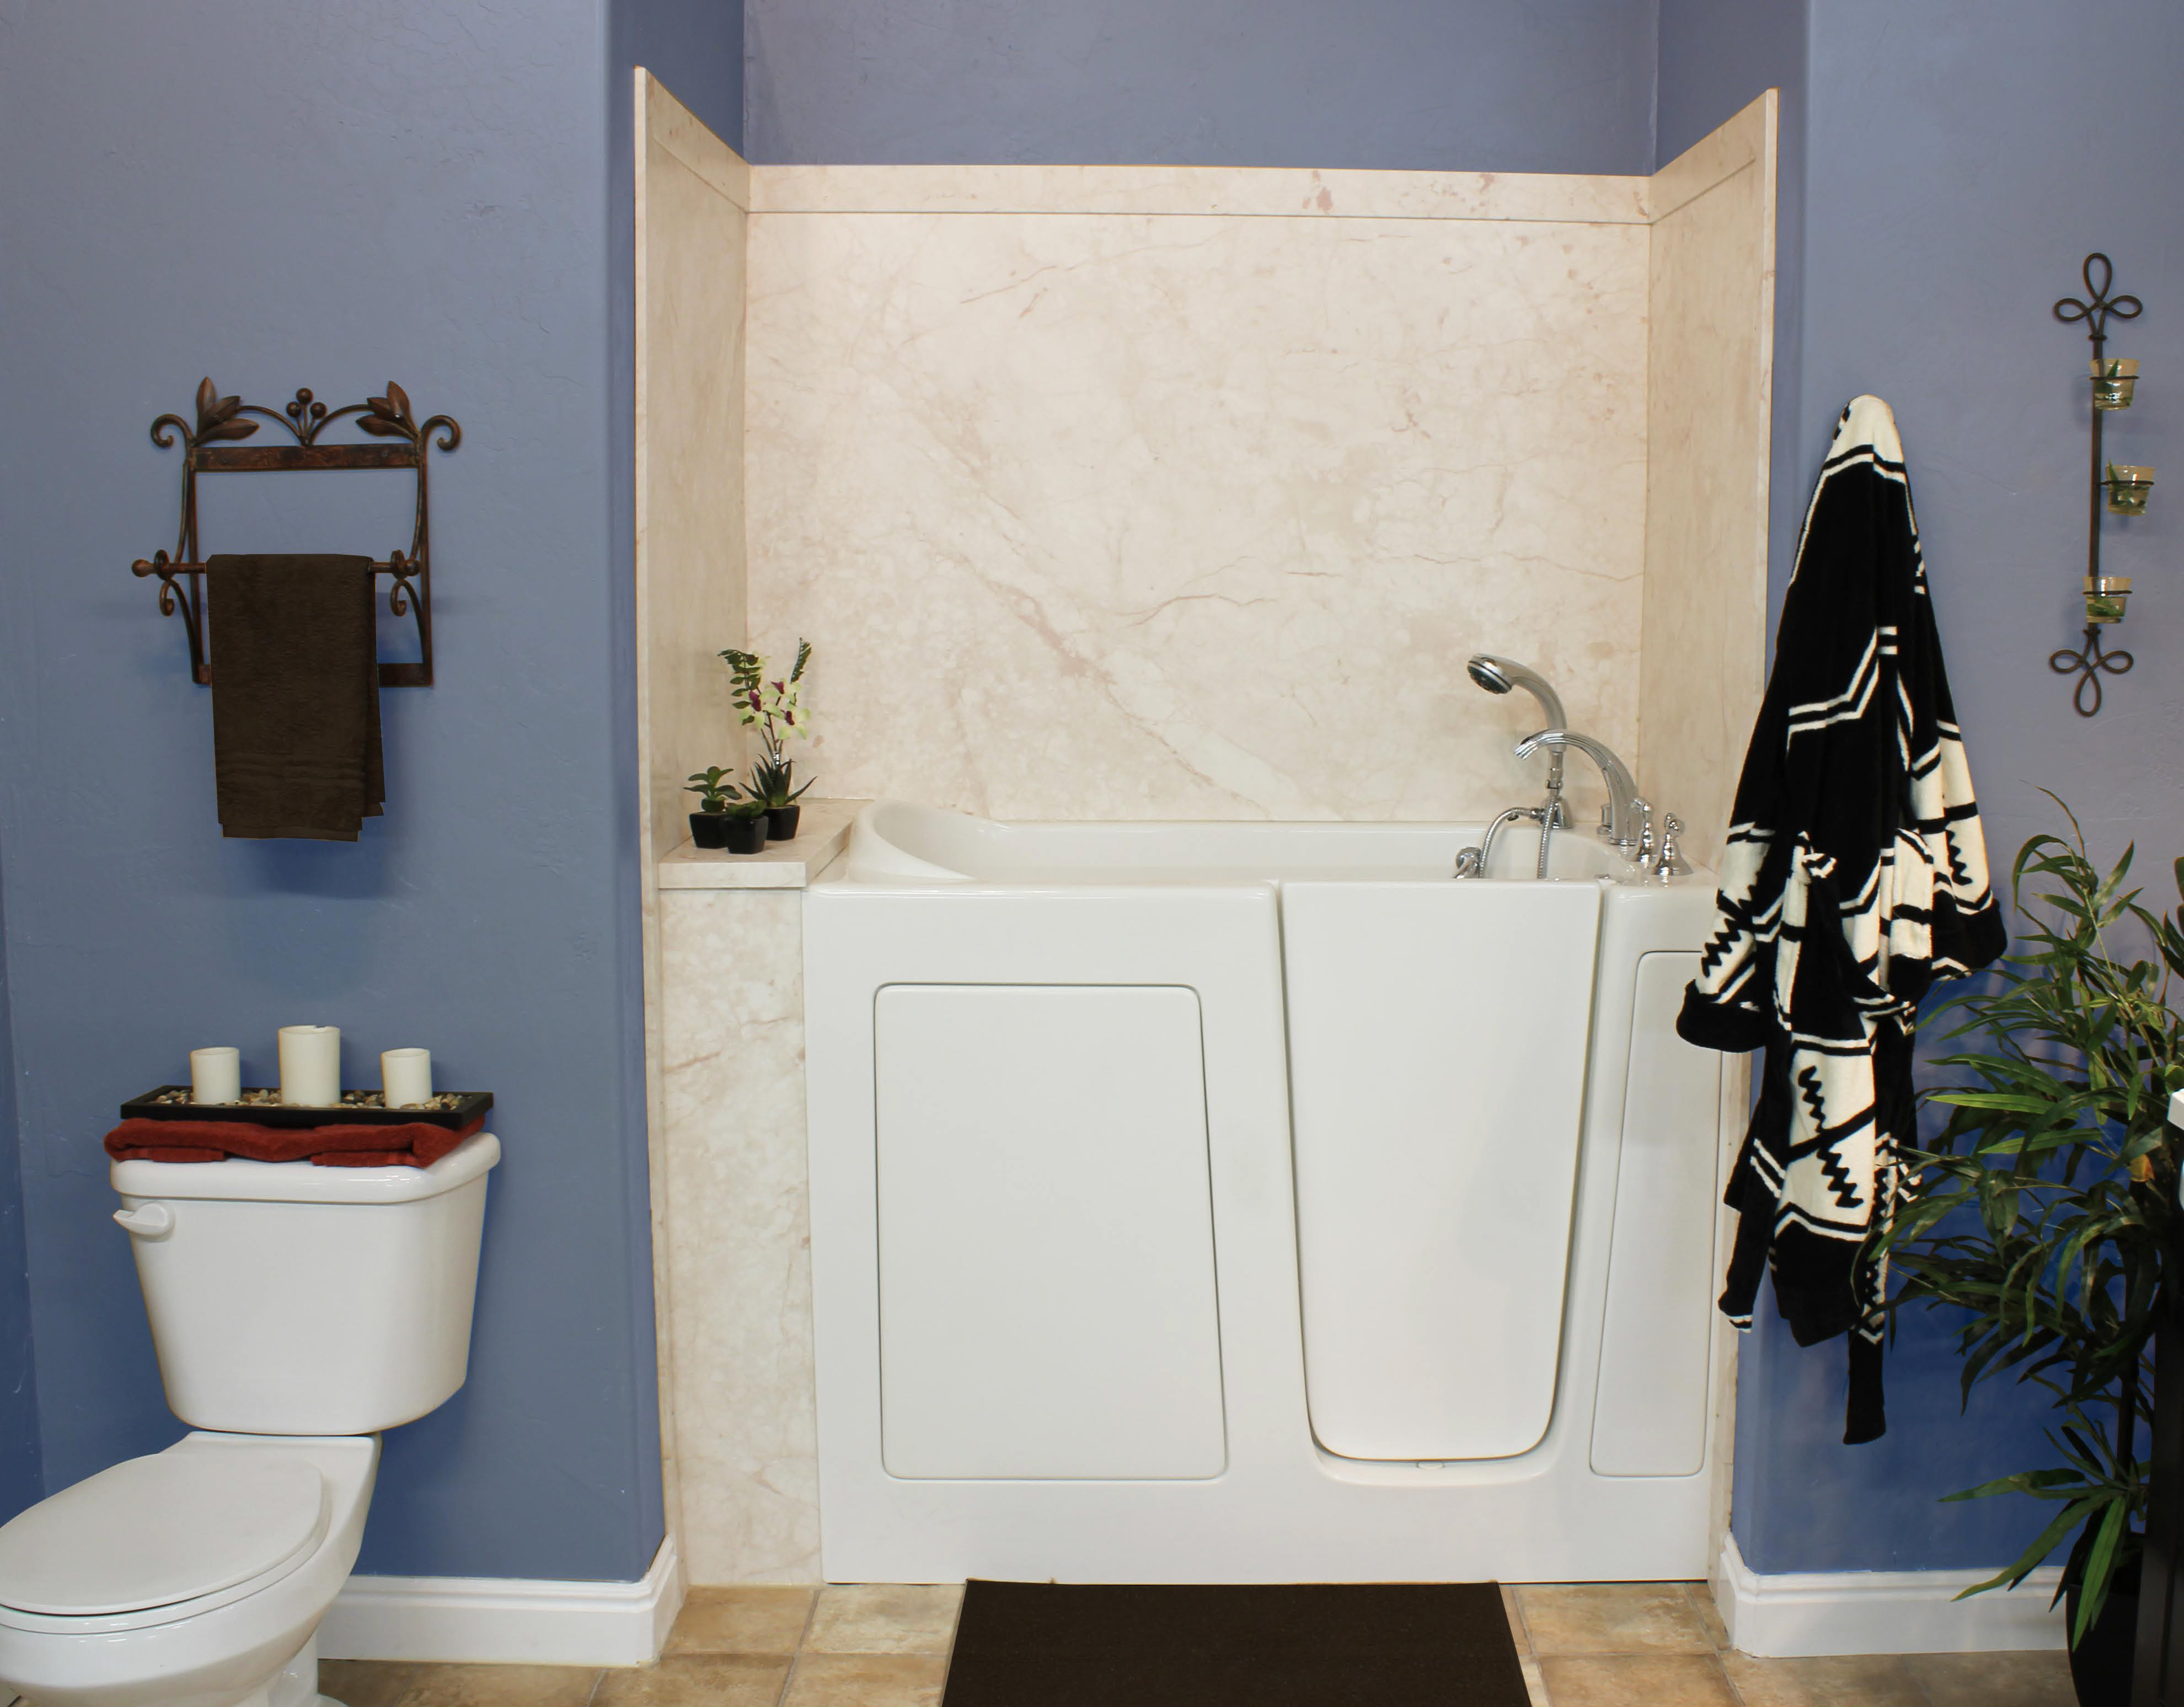 walk-in tub for Brampton, ON